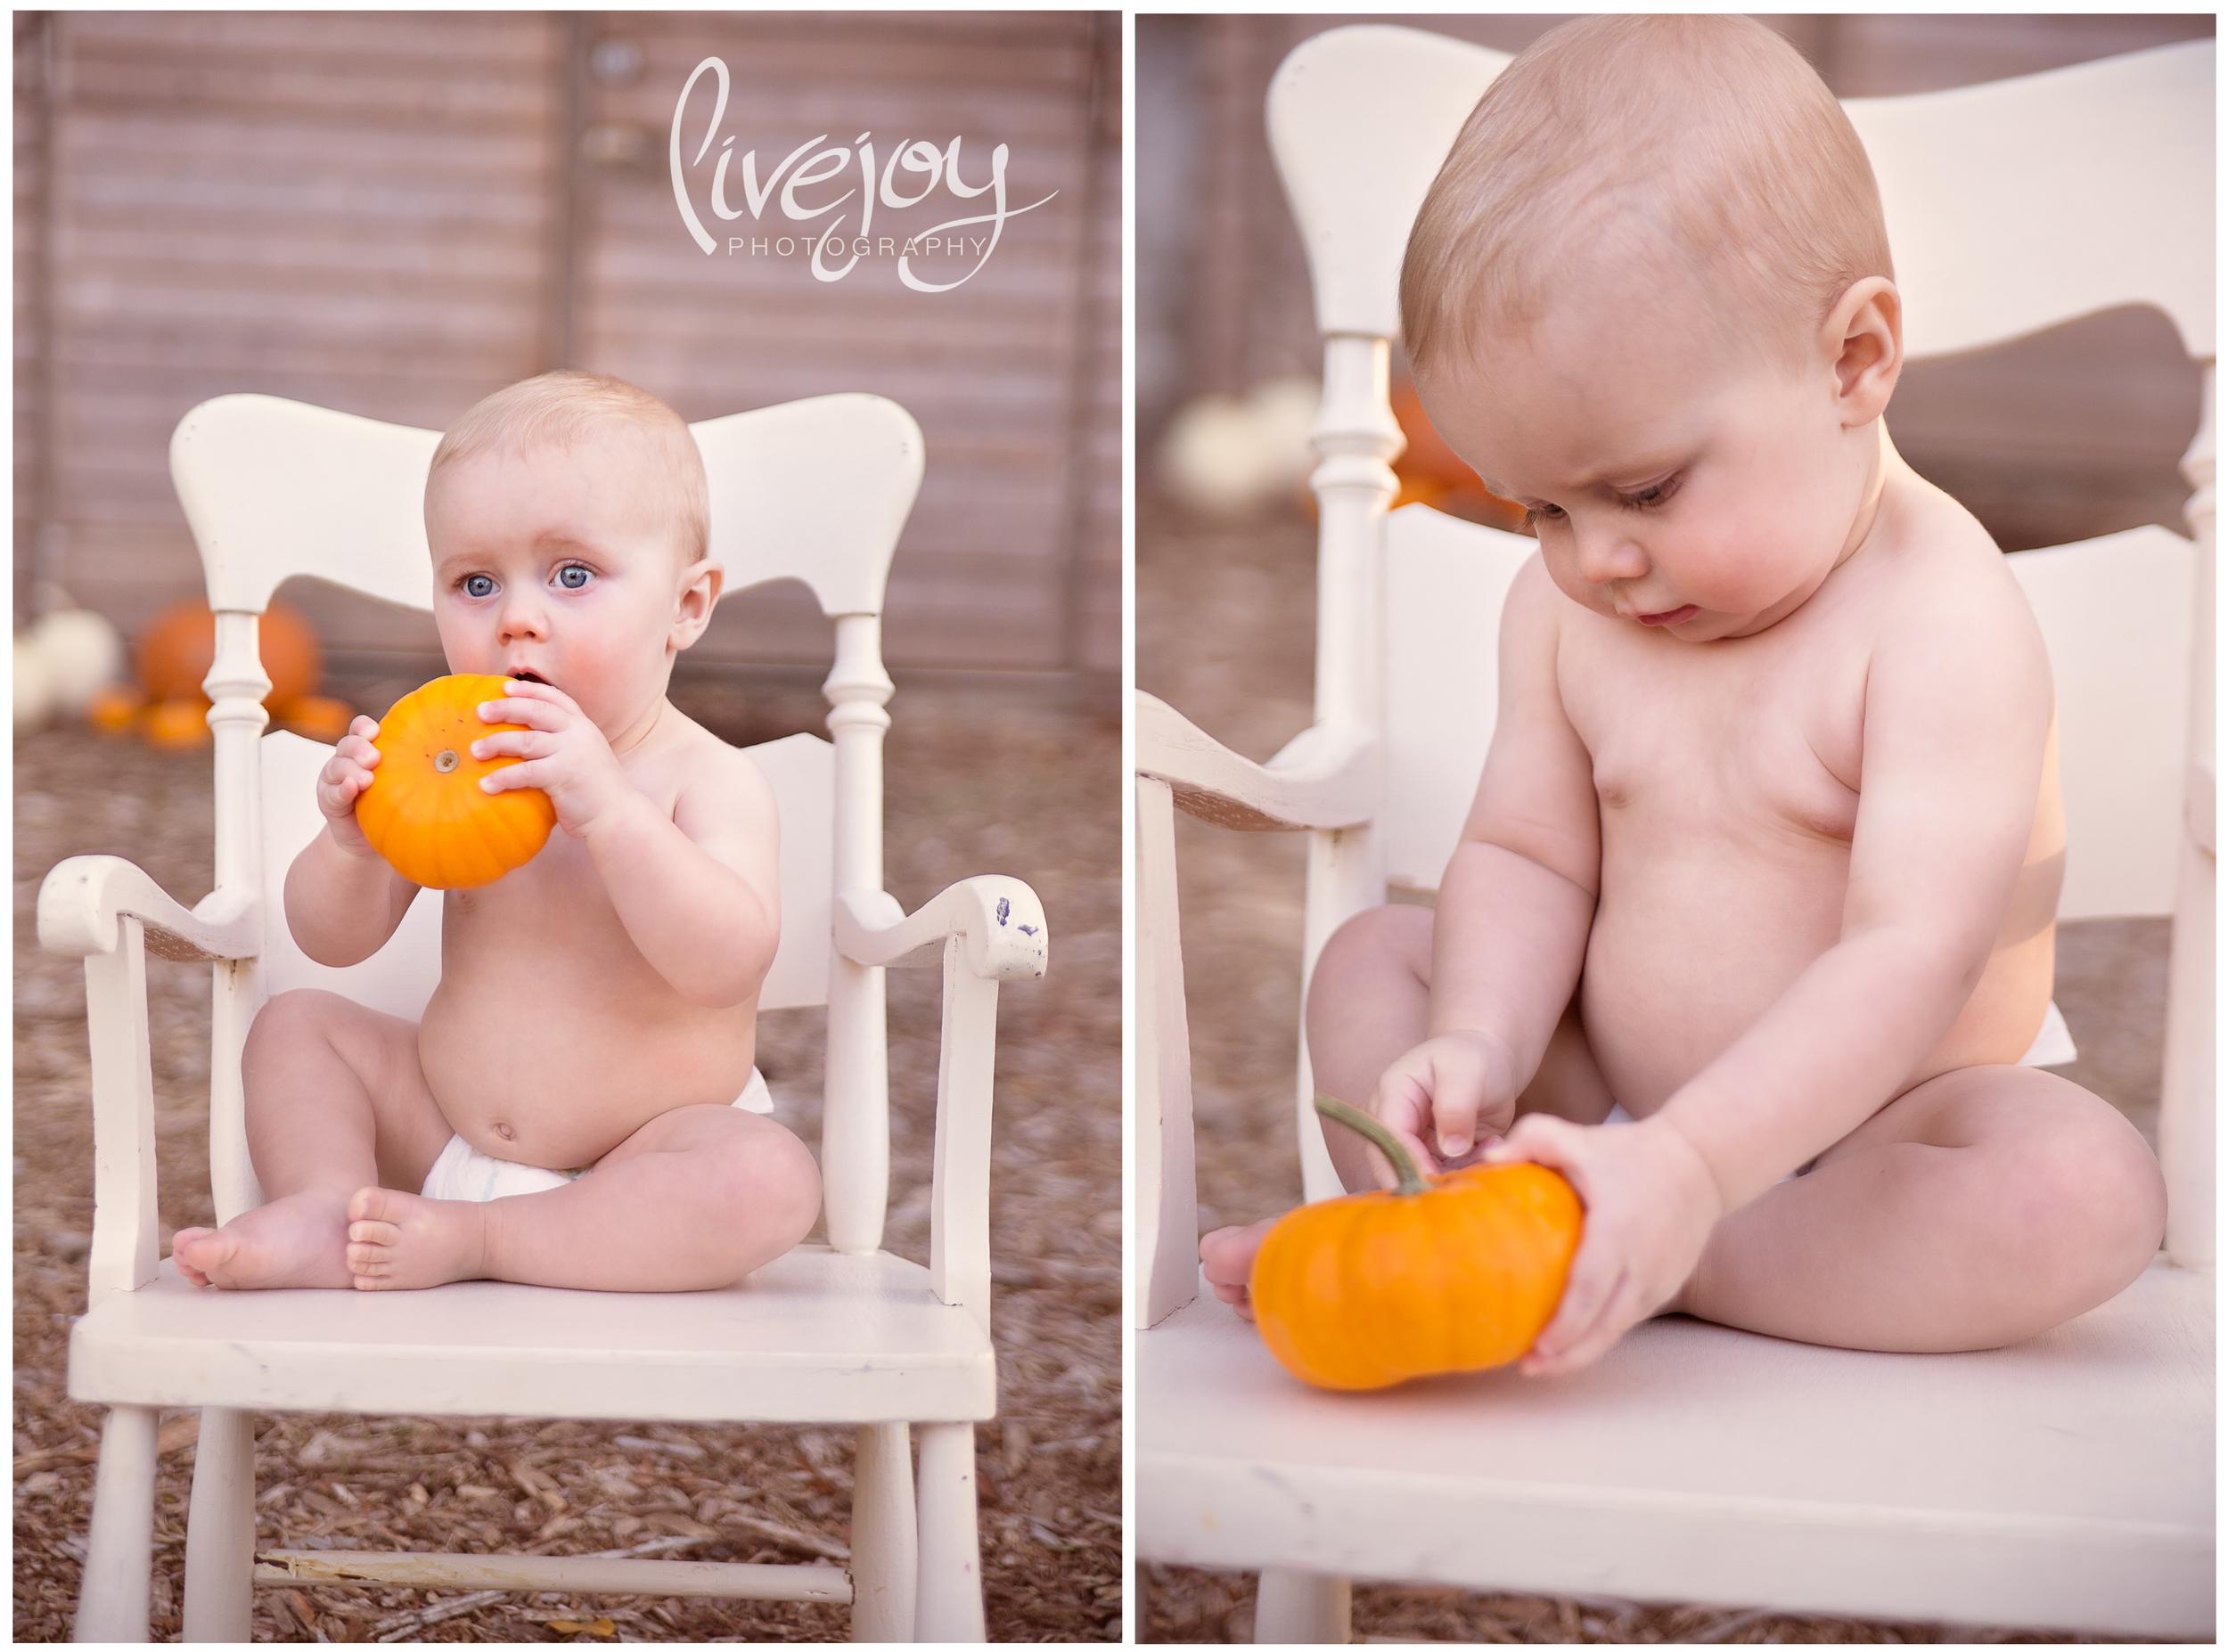 10 Months Baby Milestone | LiveJoy Photography | Oregon